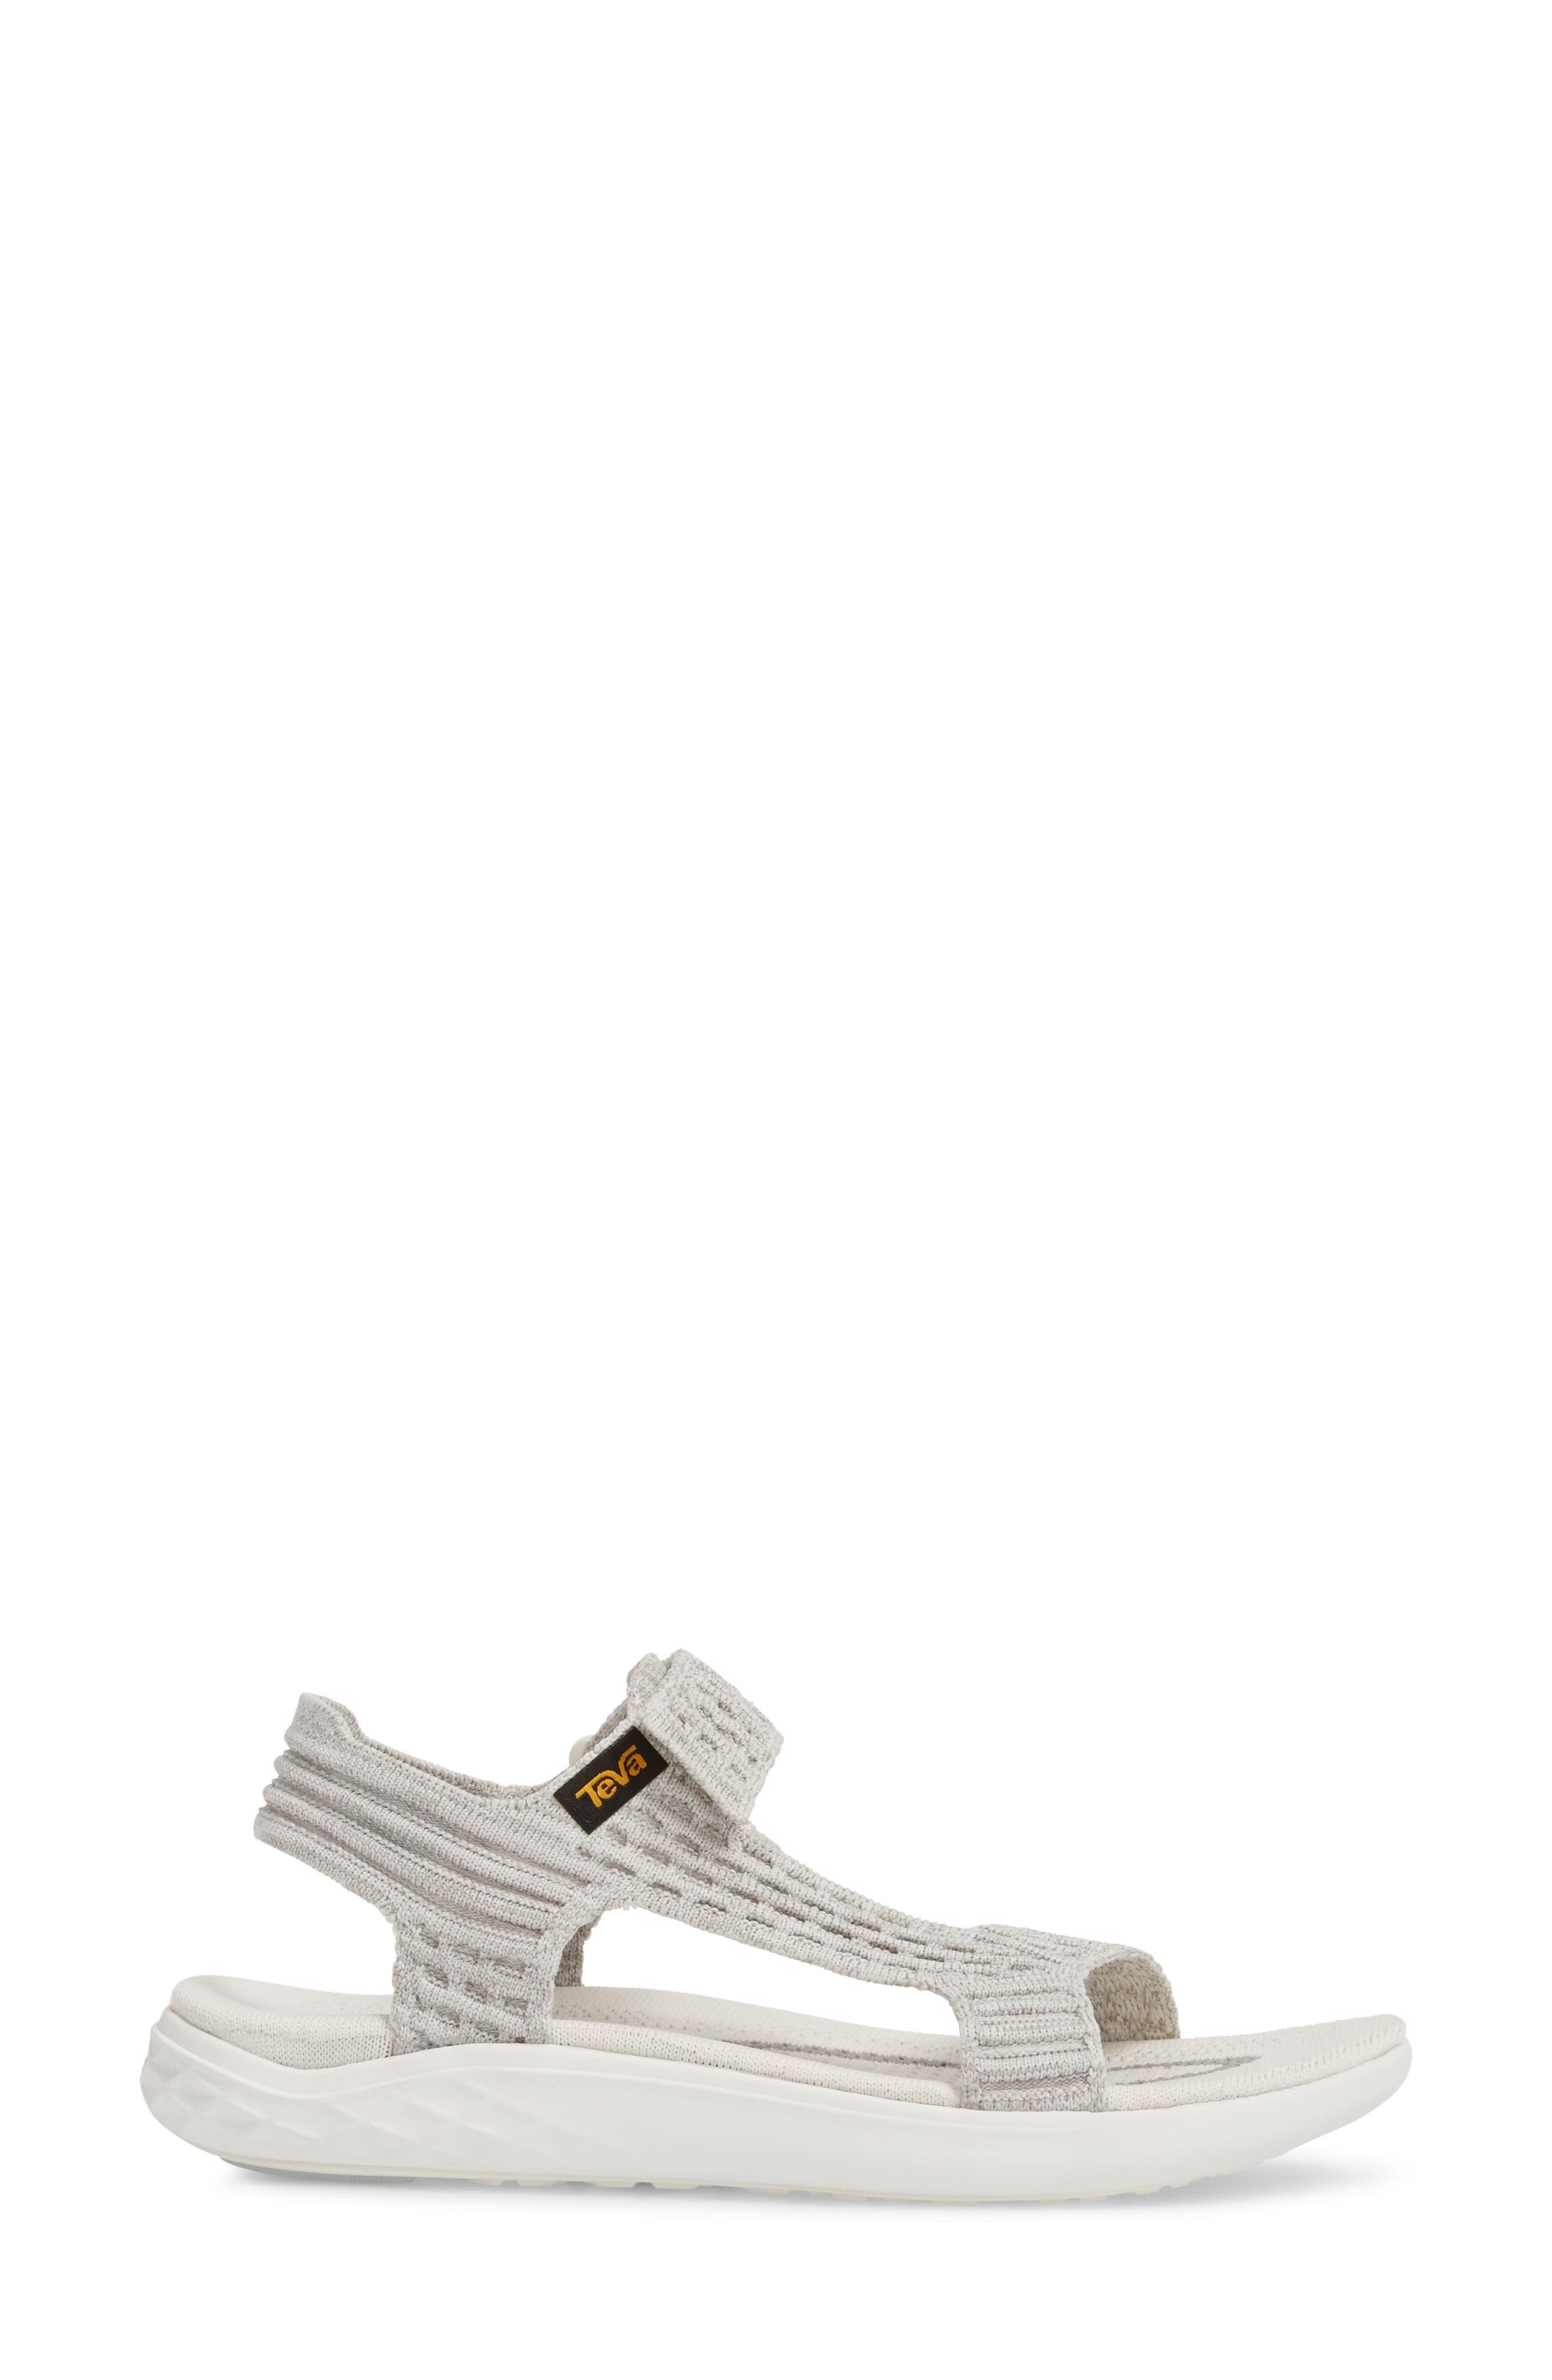 Terra Float 2 Knit Universal Sandal,                             Alternate thumbnail 3, color,                             Bright White Fabric